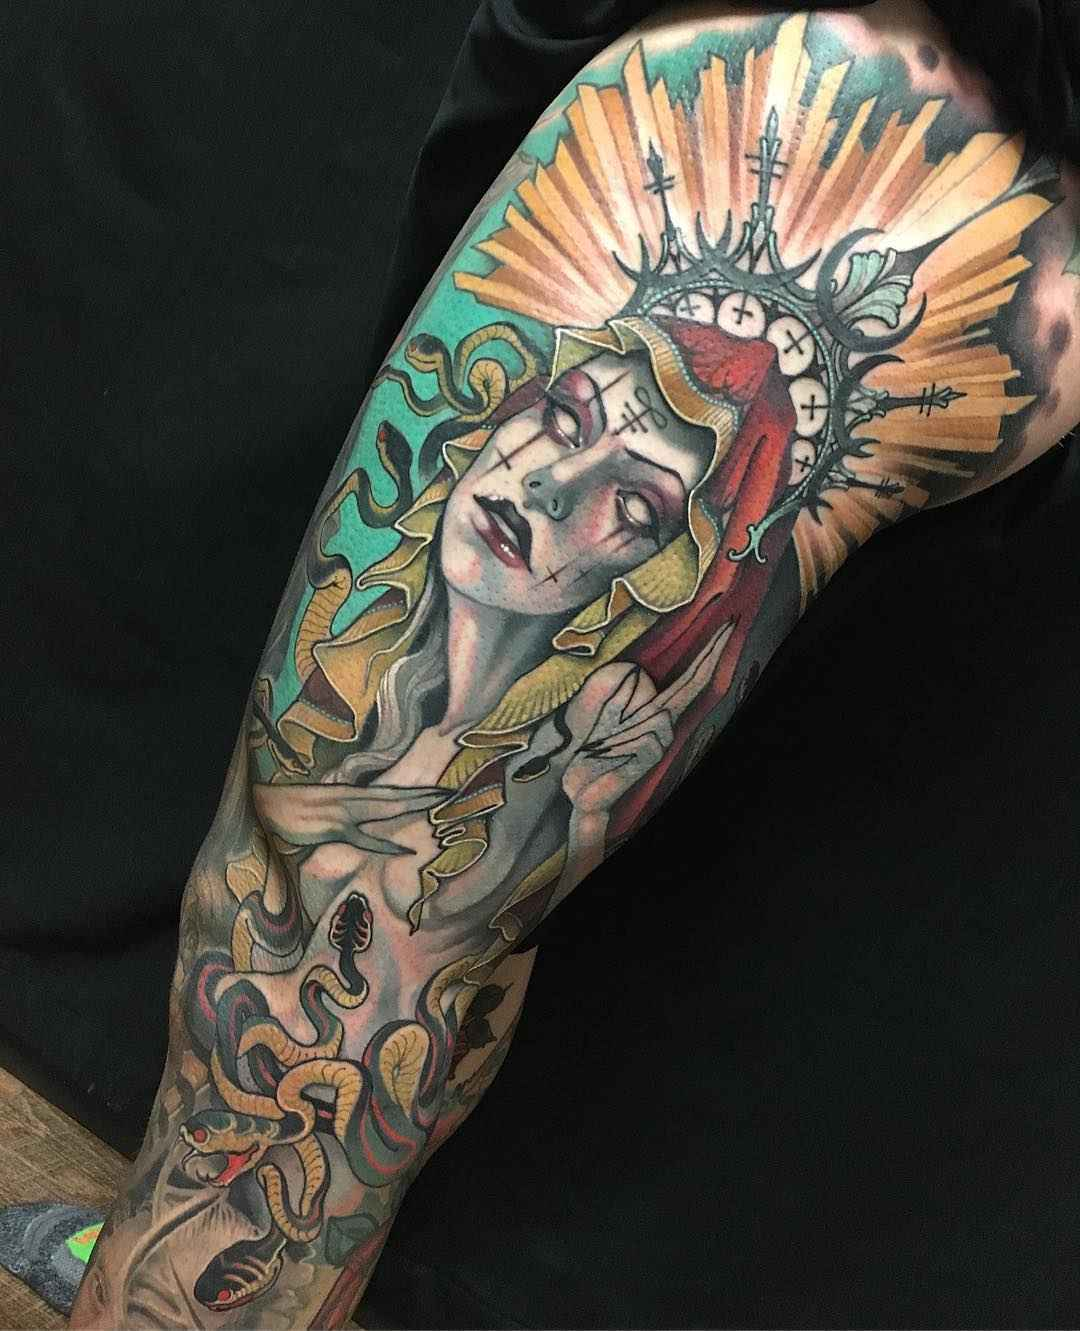 Tattoo Artist Teresa Sharpe